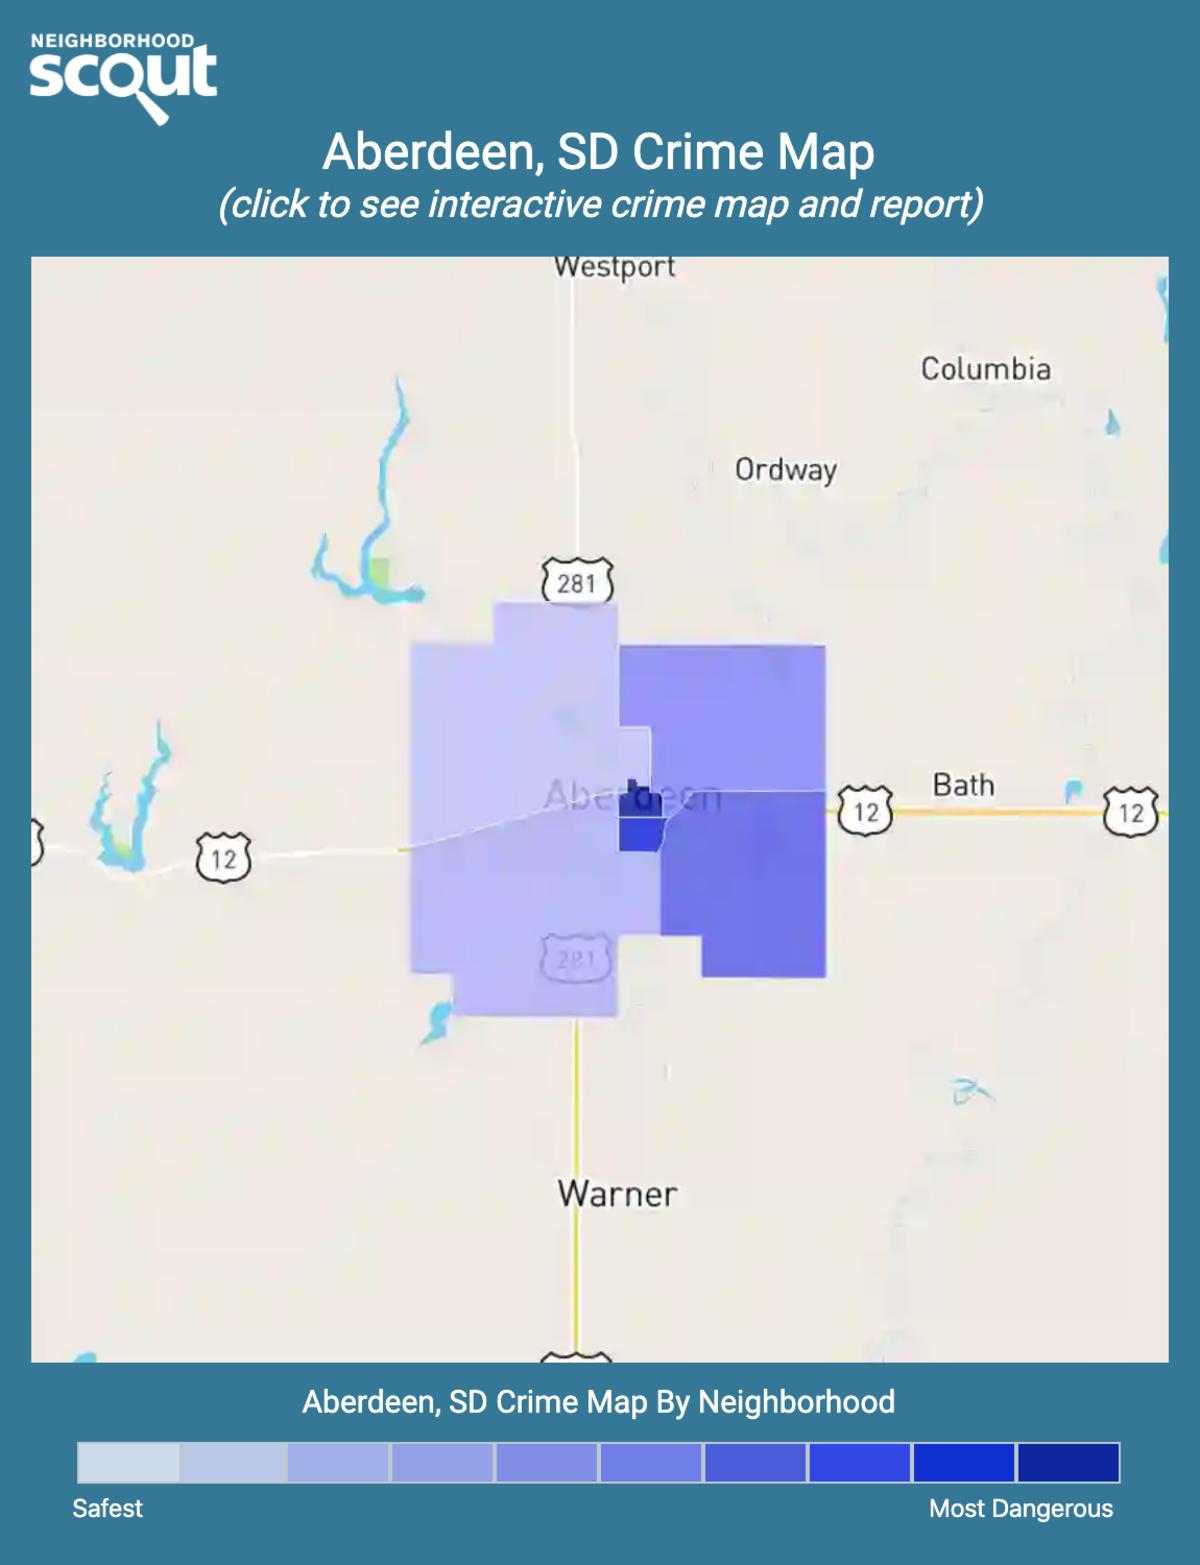 Aberdeen, South Dakota crime map